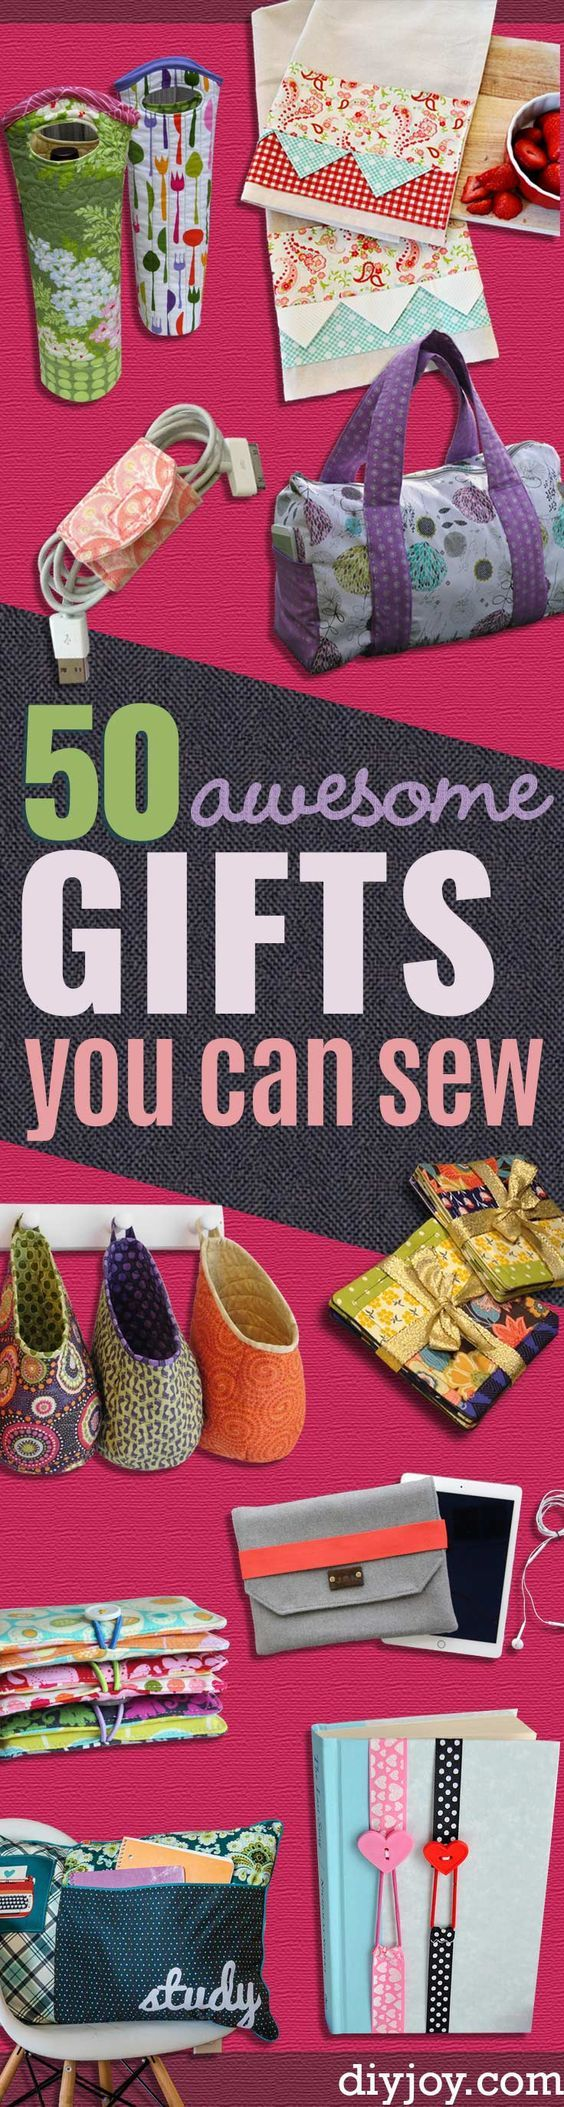 Sewing crafts for teens - Sewing Crafts For Teens 13